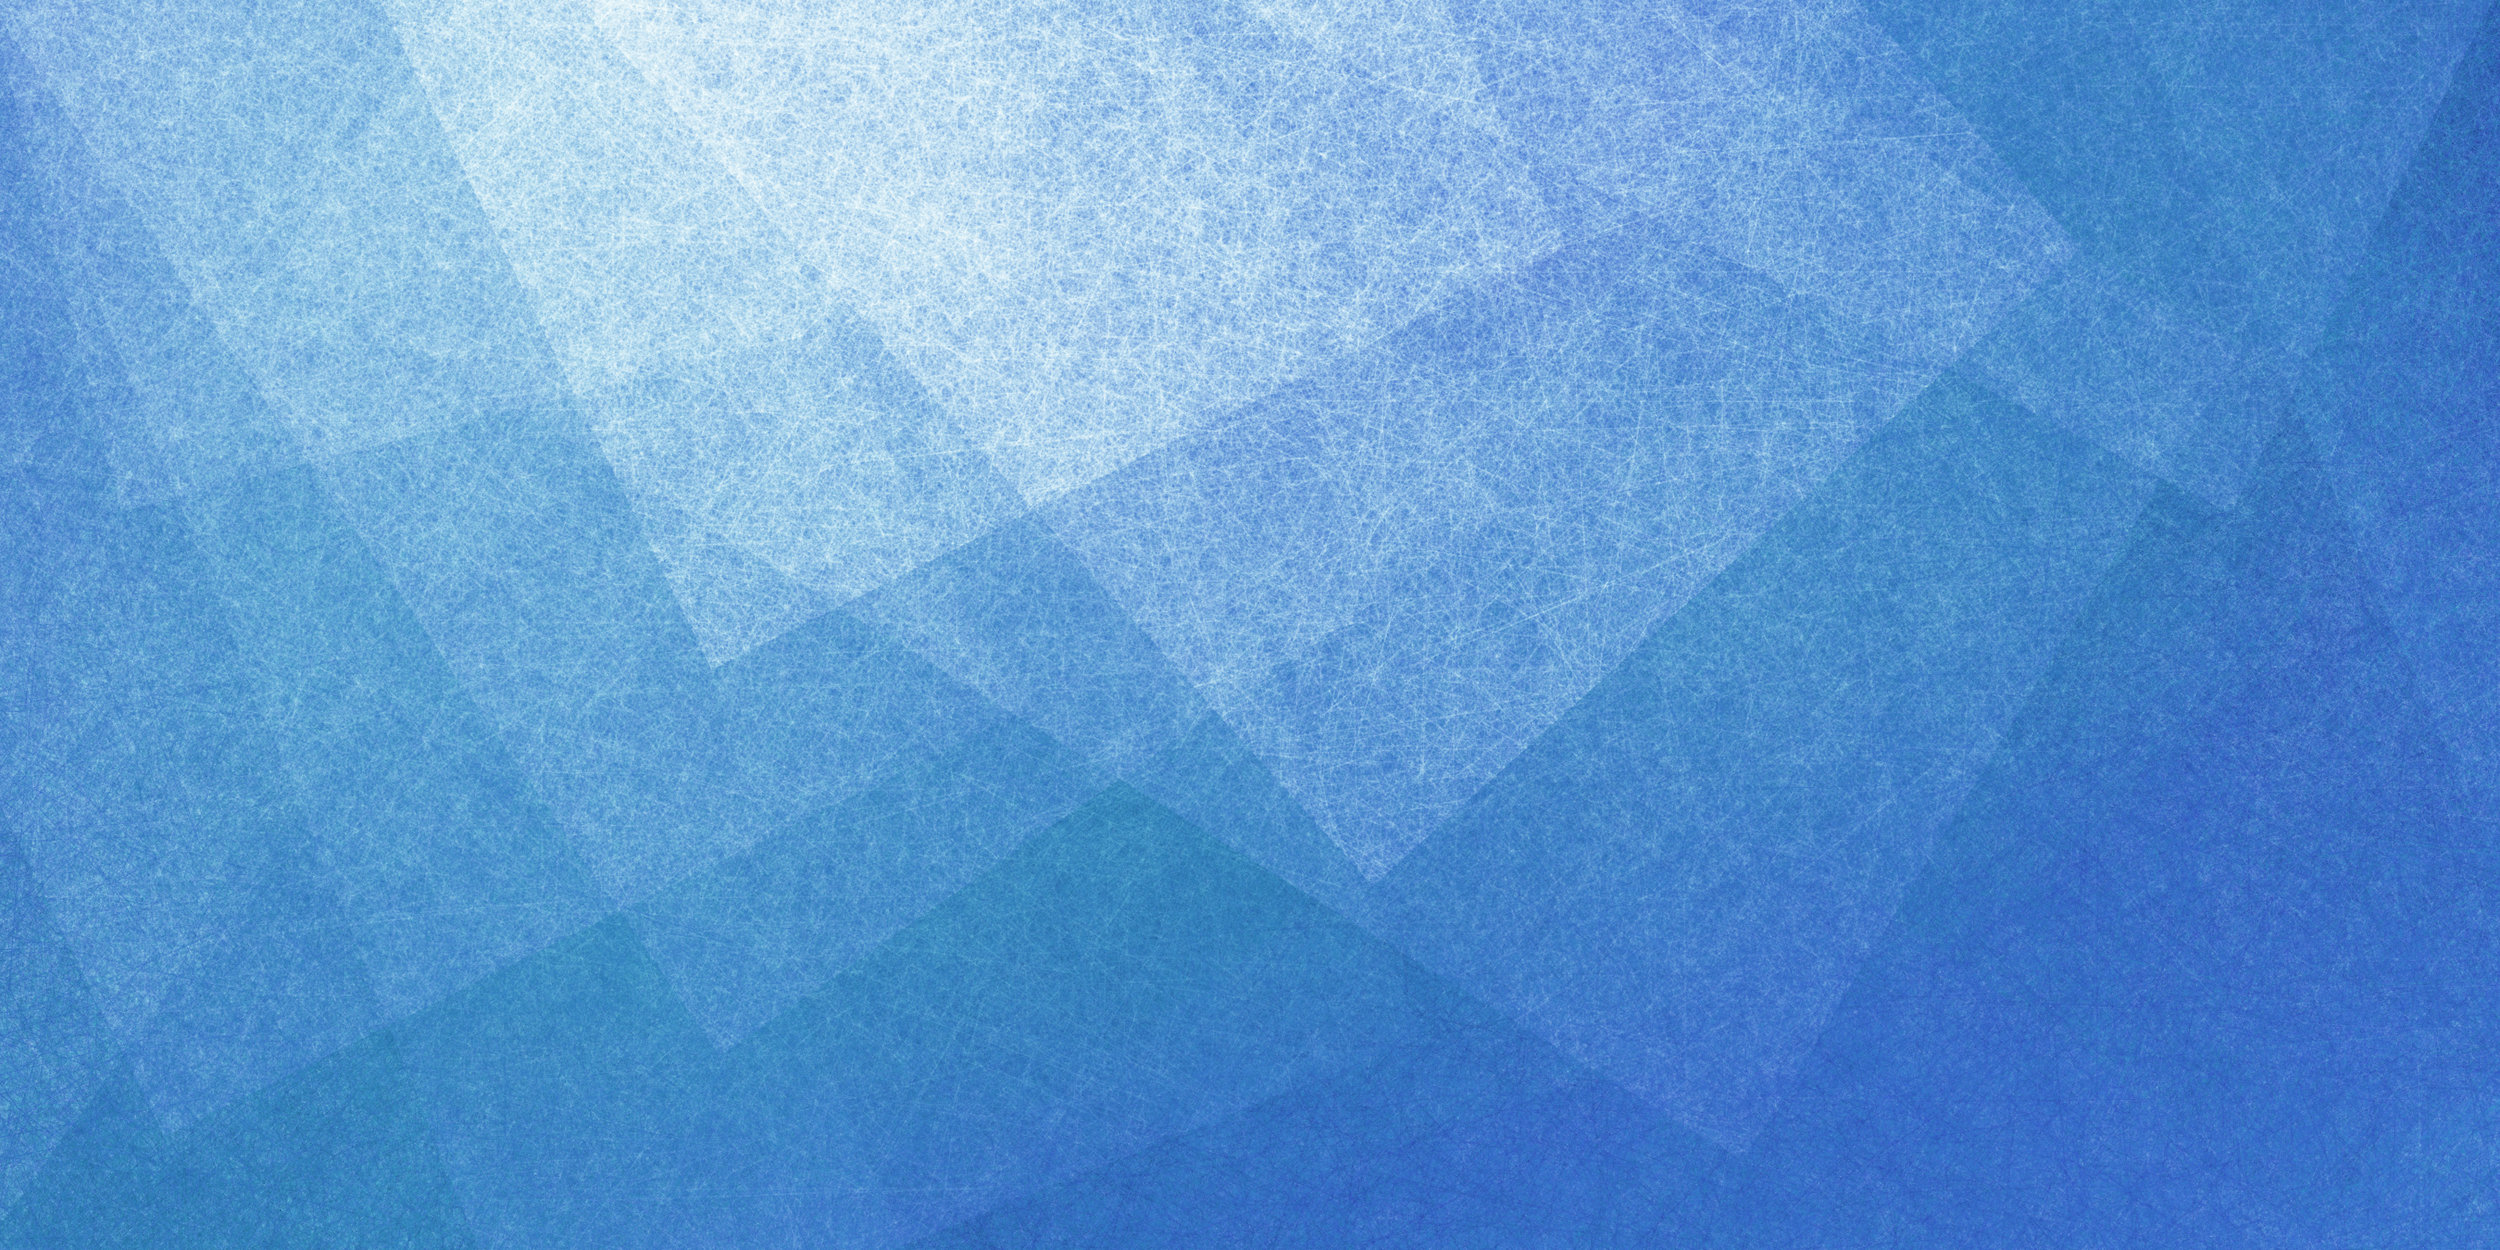 Blue_Background_104134300.jpg